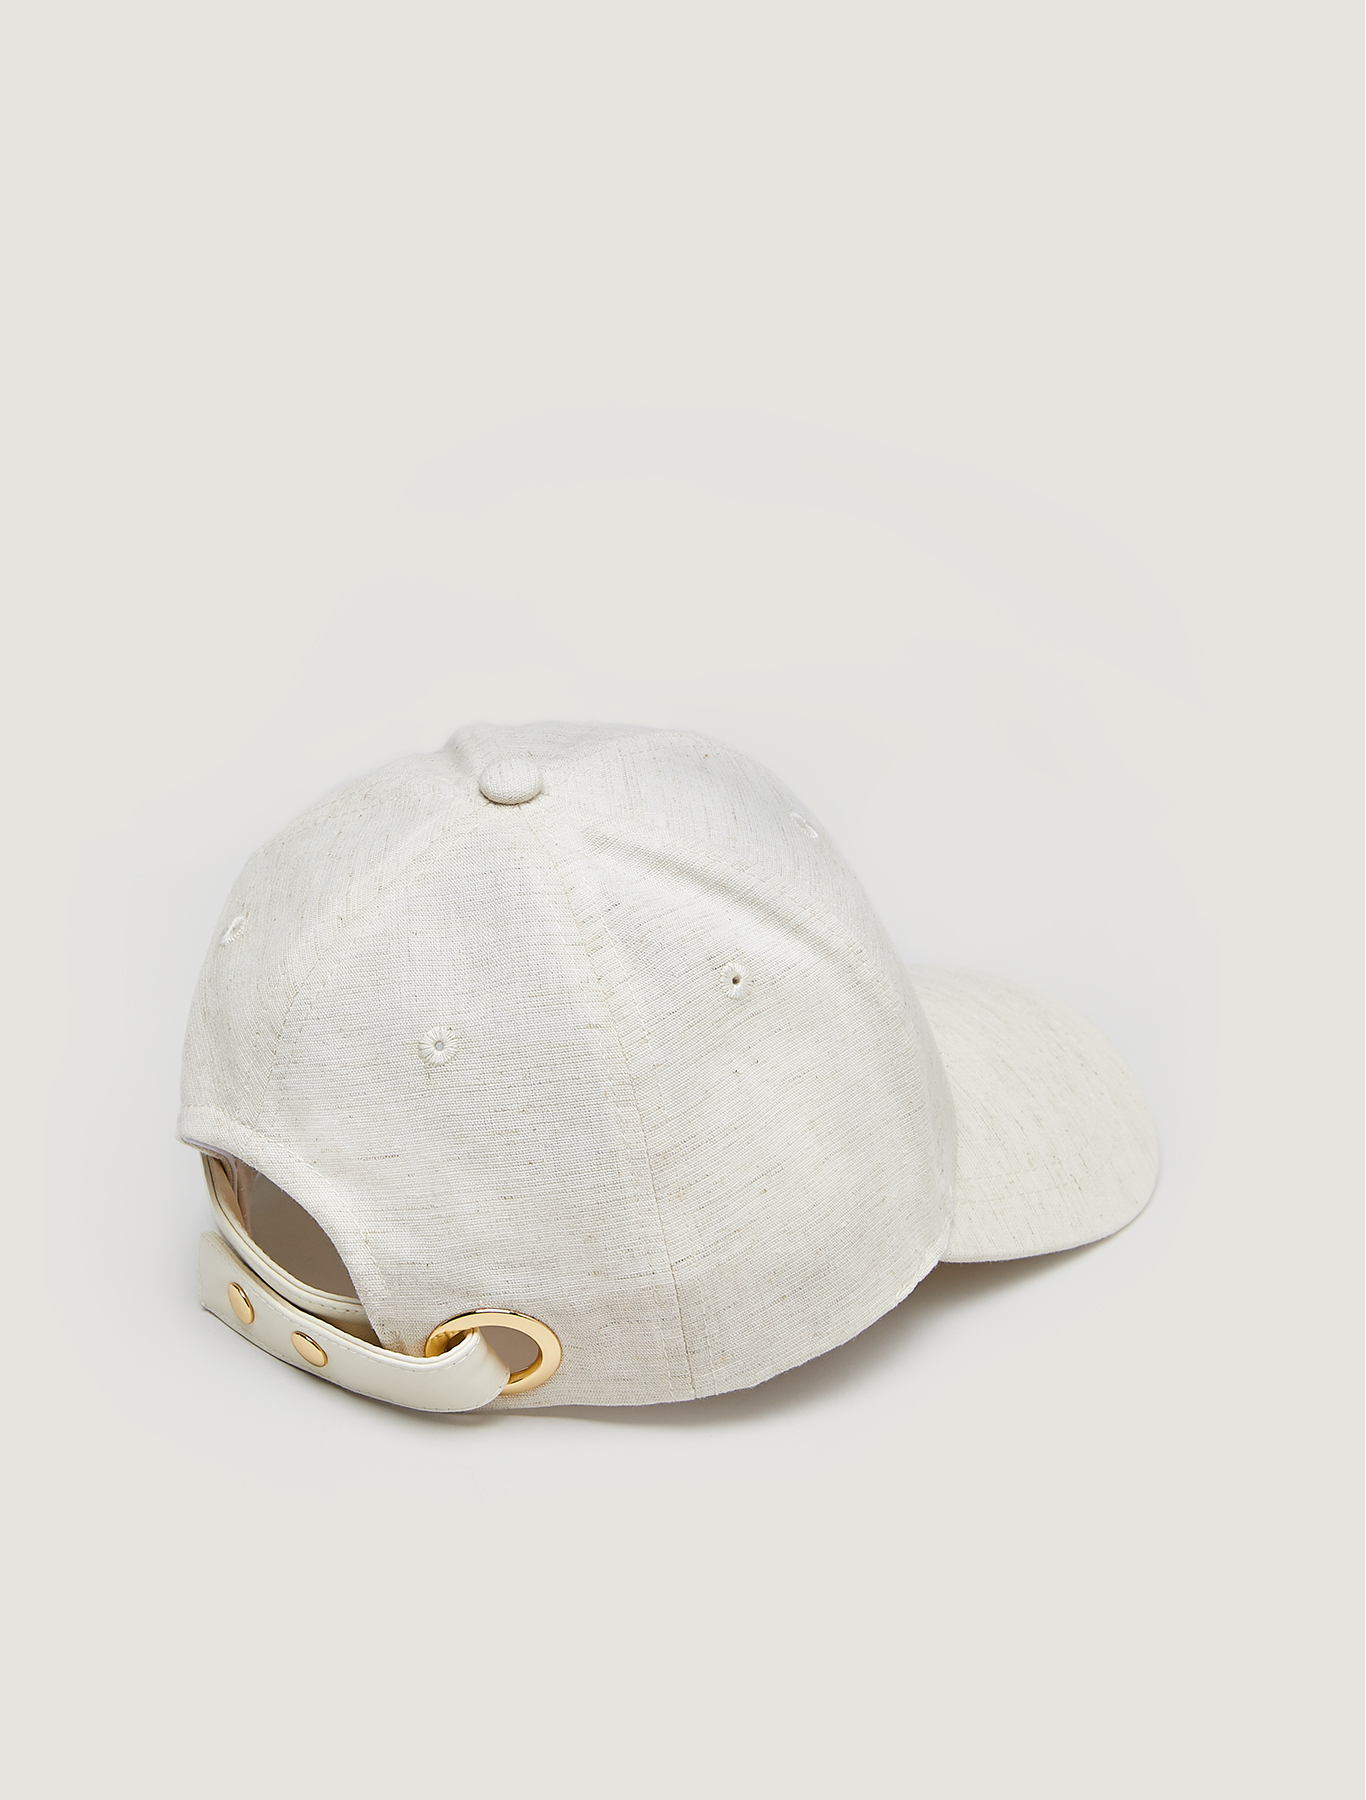 Cotton baseball cap - beige - pennyblack